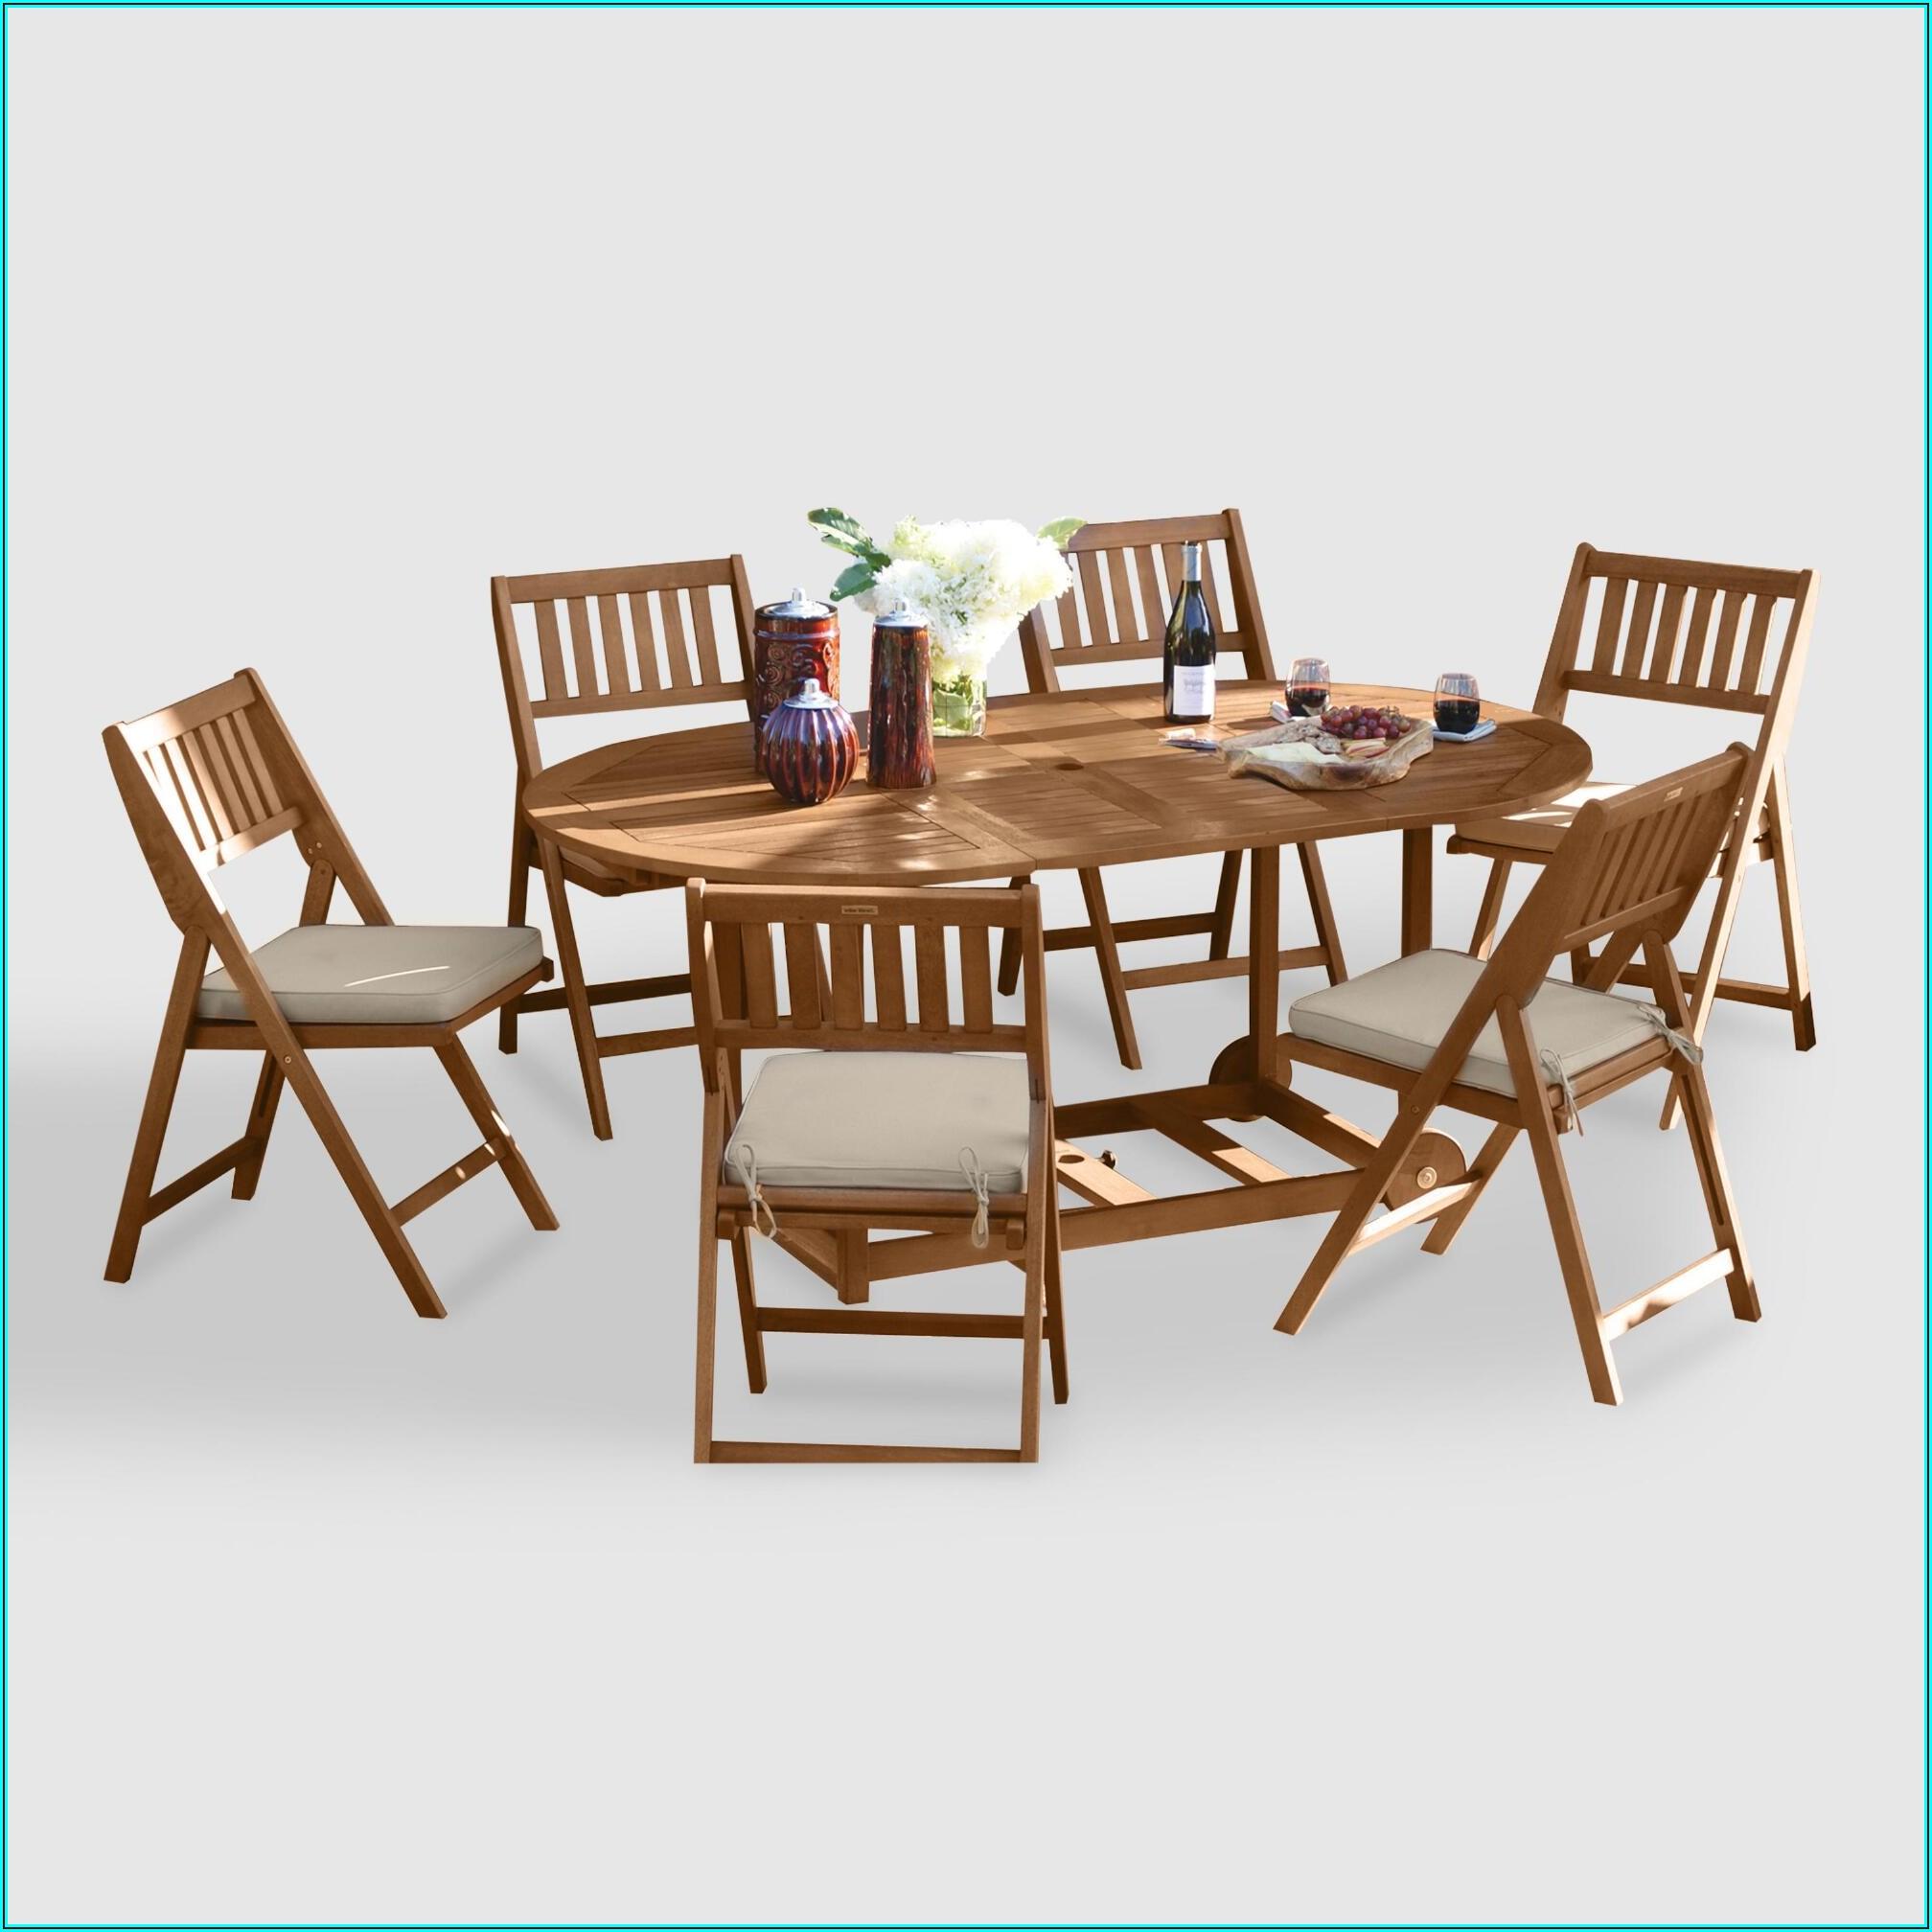 7 Piece Folding Patio Dining Set